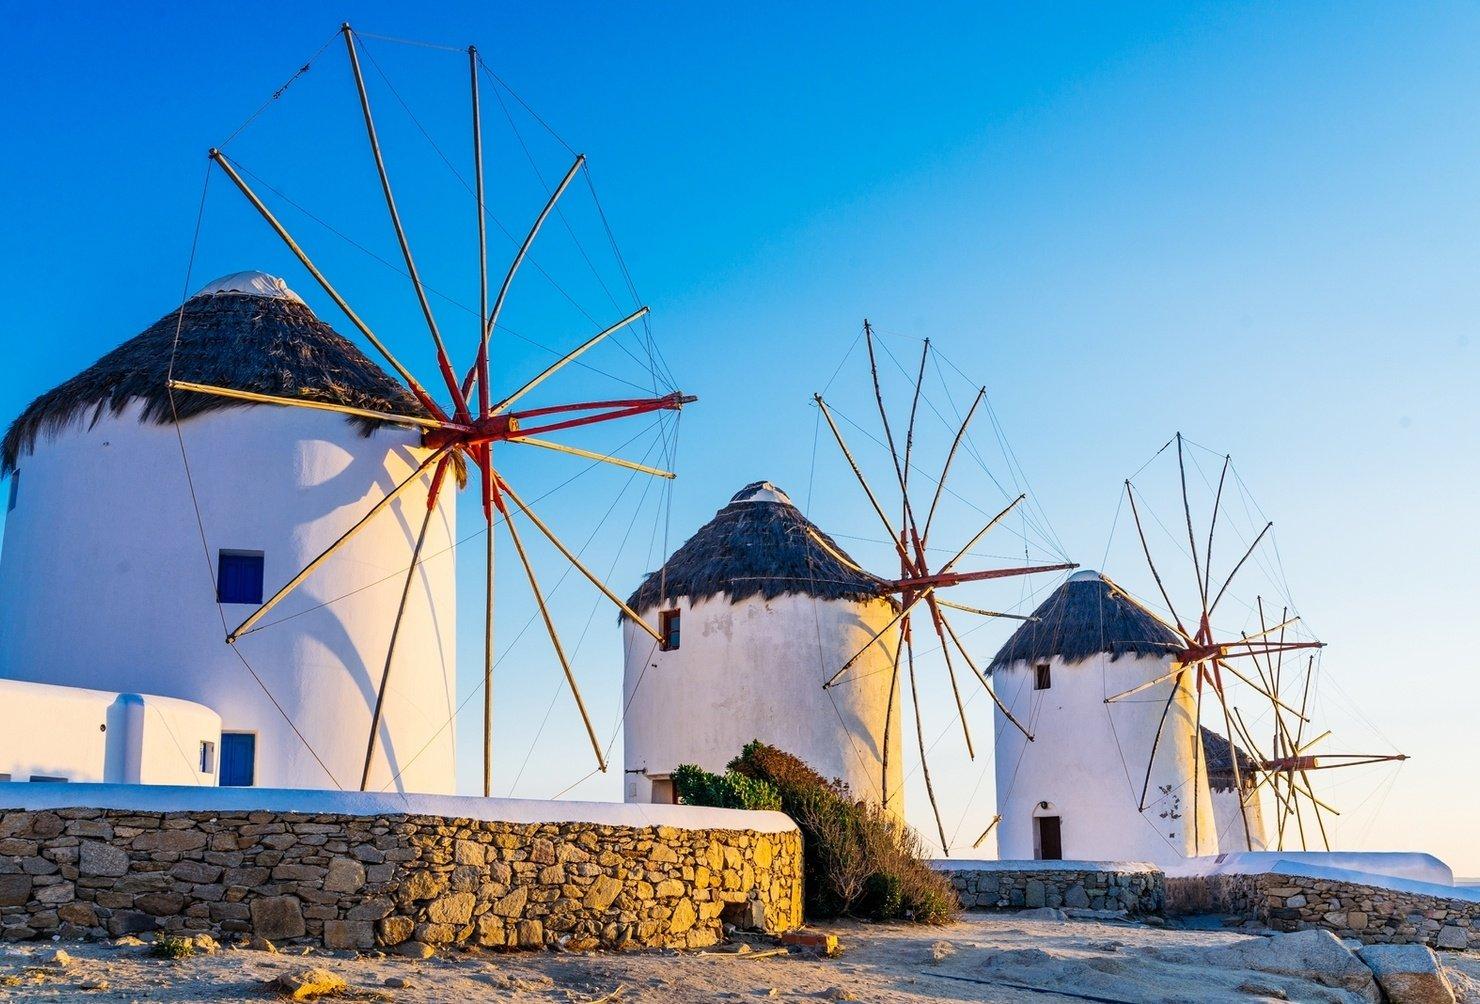 Greek Island With Windmills